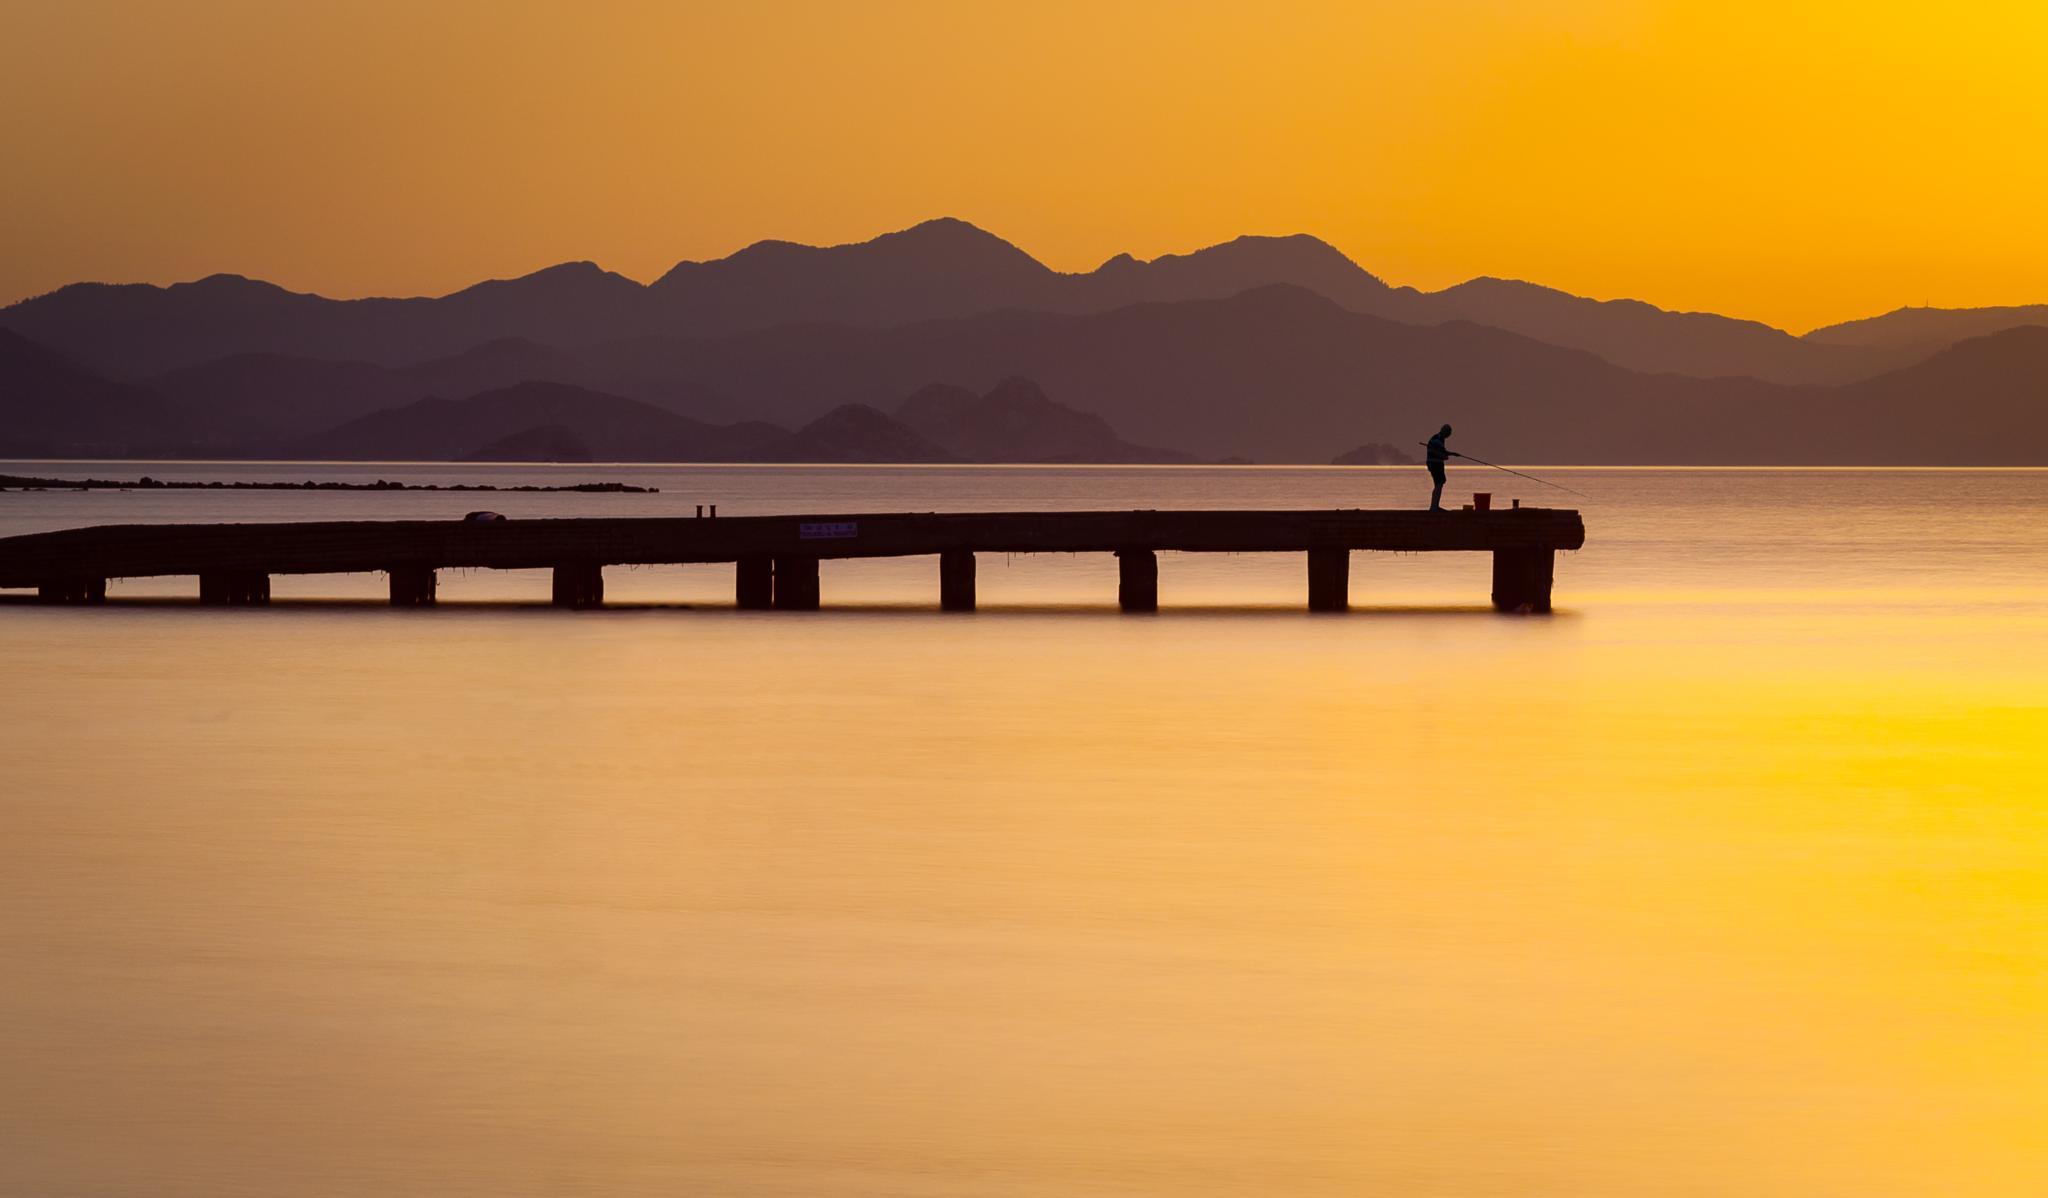 The Lone Fisherman by Steven Johnson